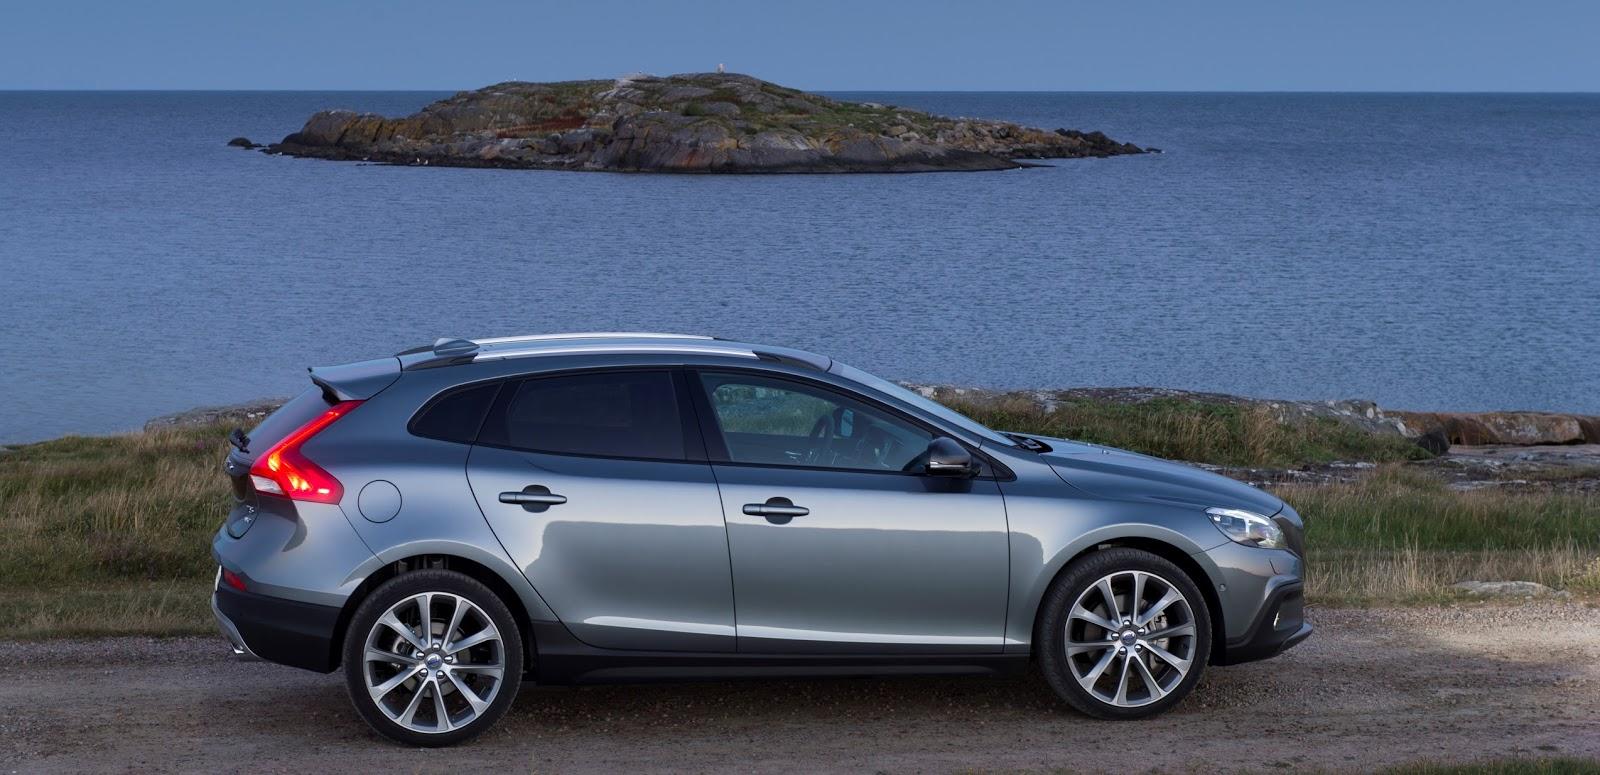 VOLVO%2BV40%2BCROSS%2BCOUNTRY%2B1.5%2BT3%2BAUTO 4 Το Volvo V40 Cross Country με το νέο κινητήρα 1,5 λίτρων, απόδοσης 152 ίππων από 21.900 €